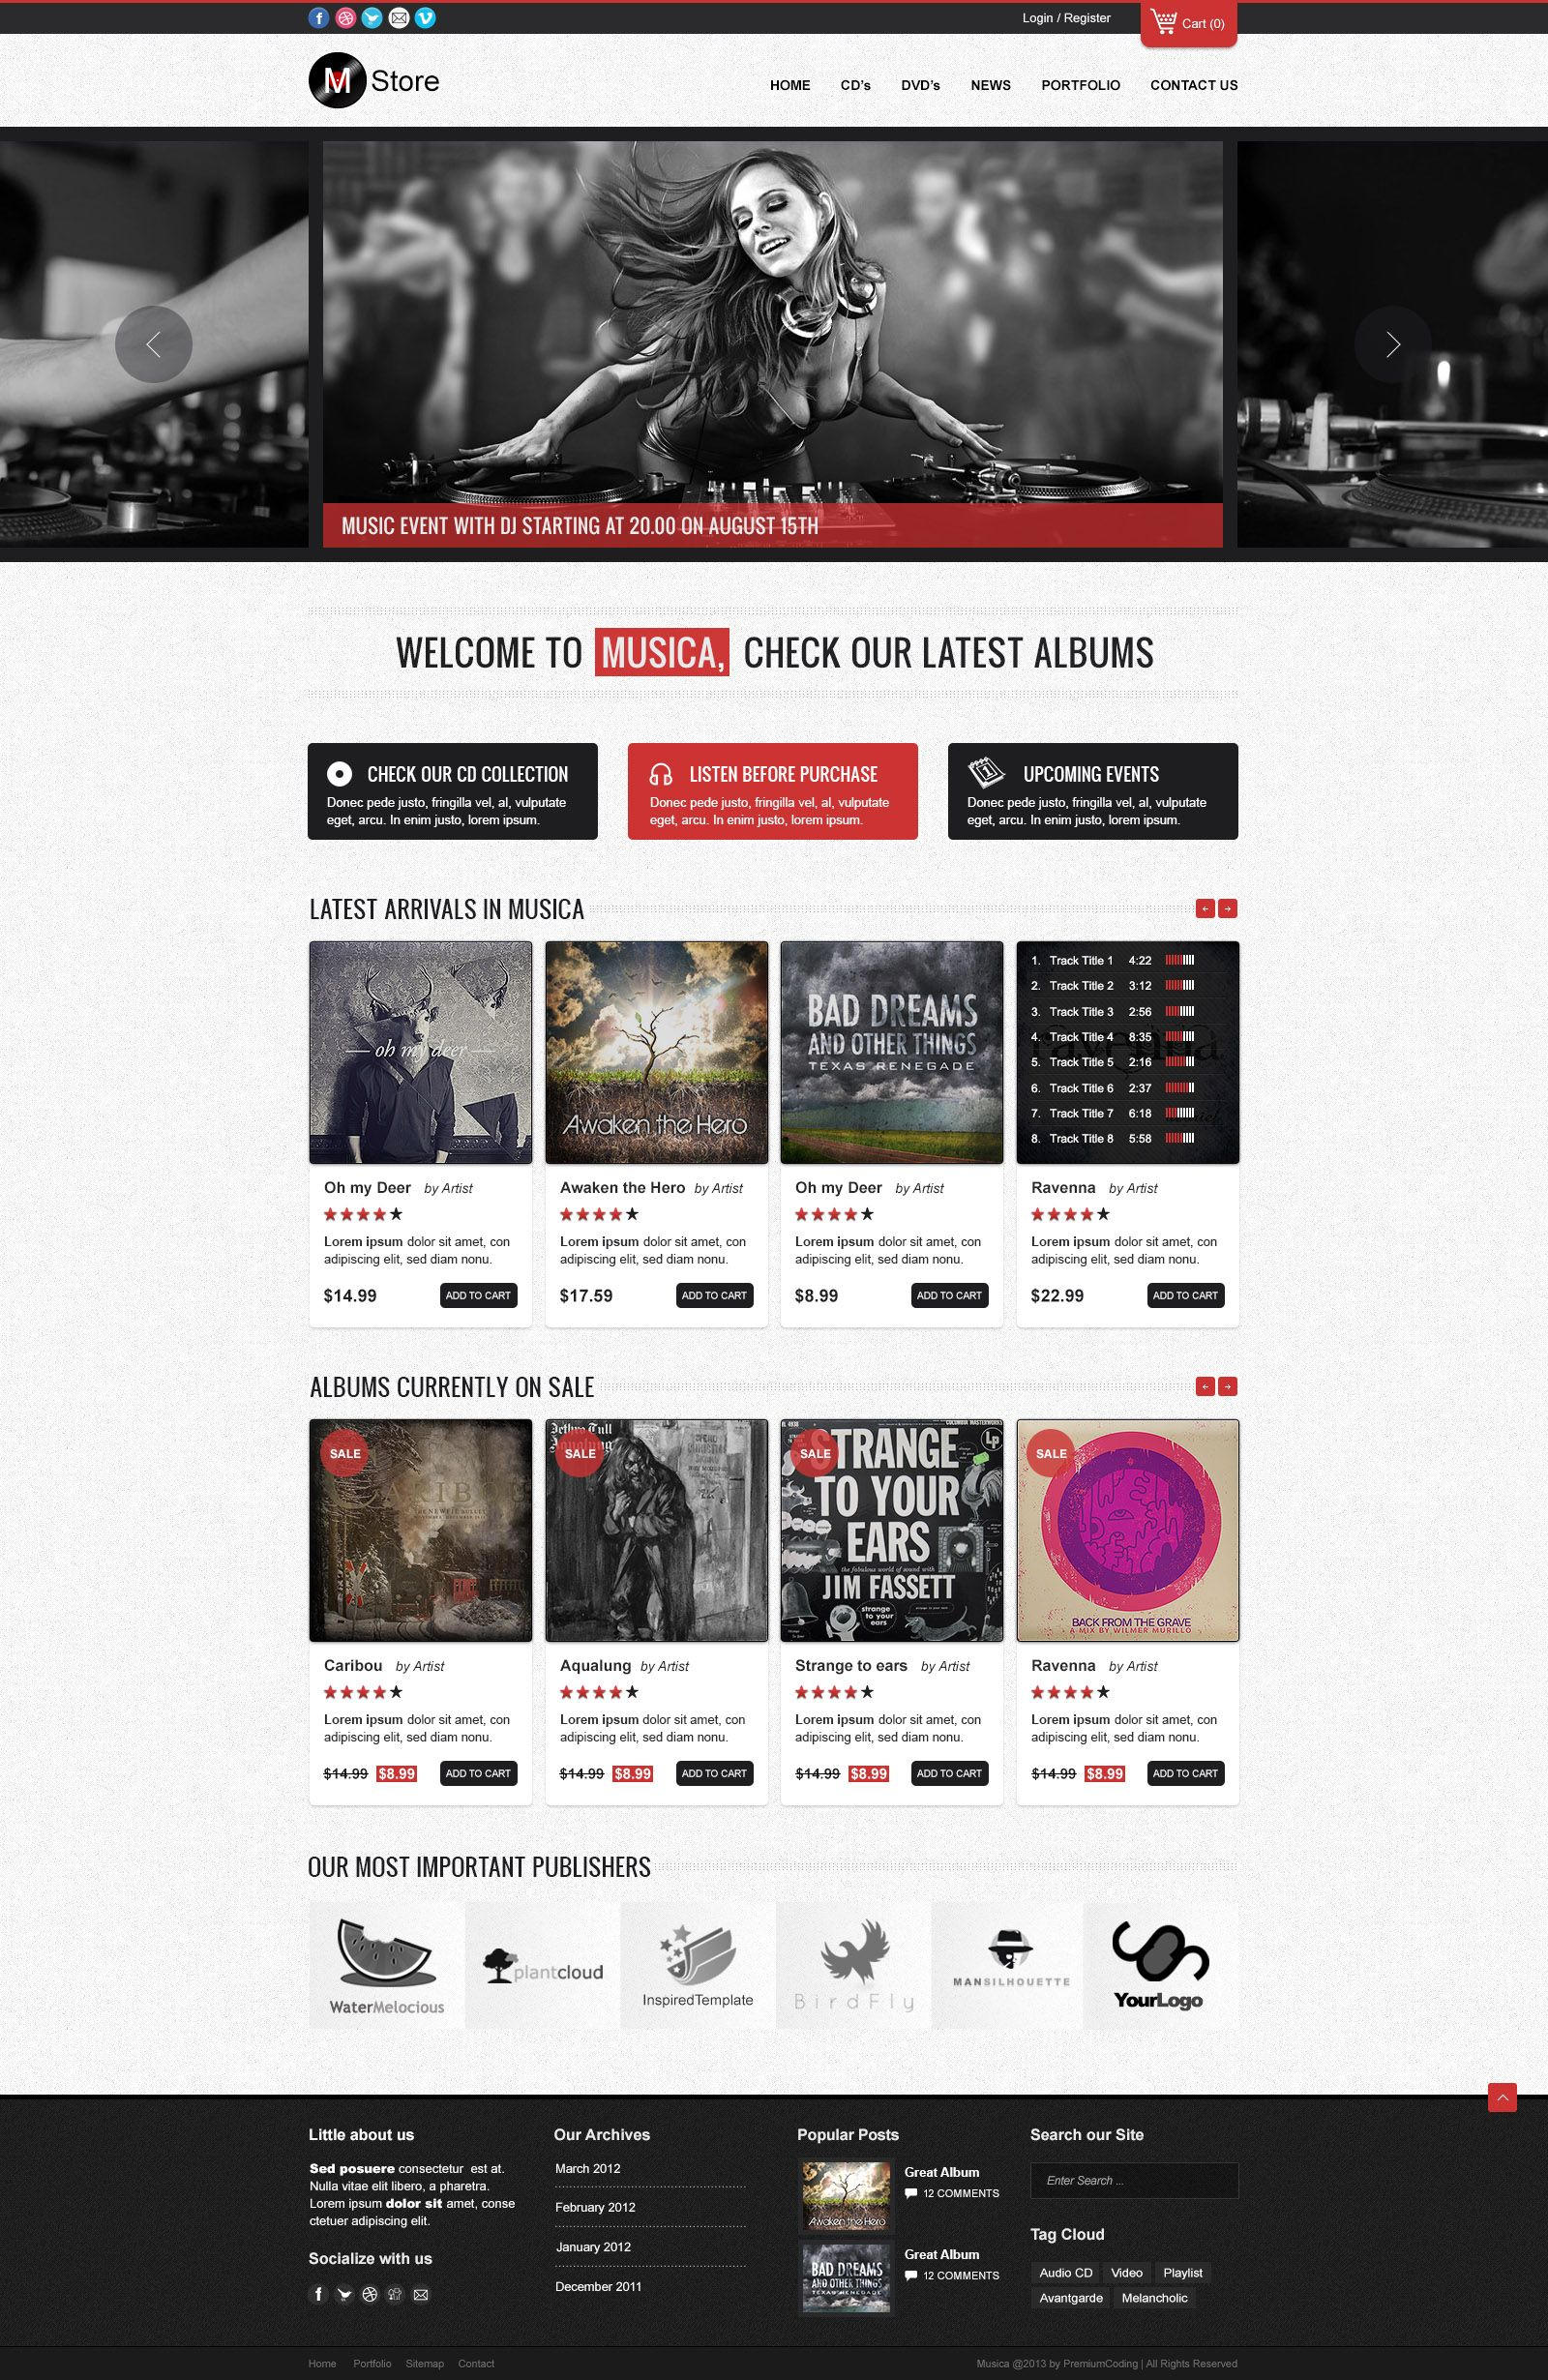 Groß Web Template Bilder Galerie - Entry Level Resume Vorlagen ...